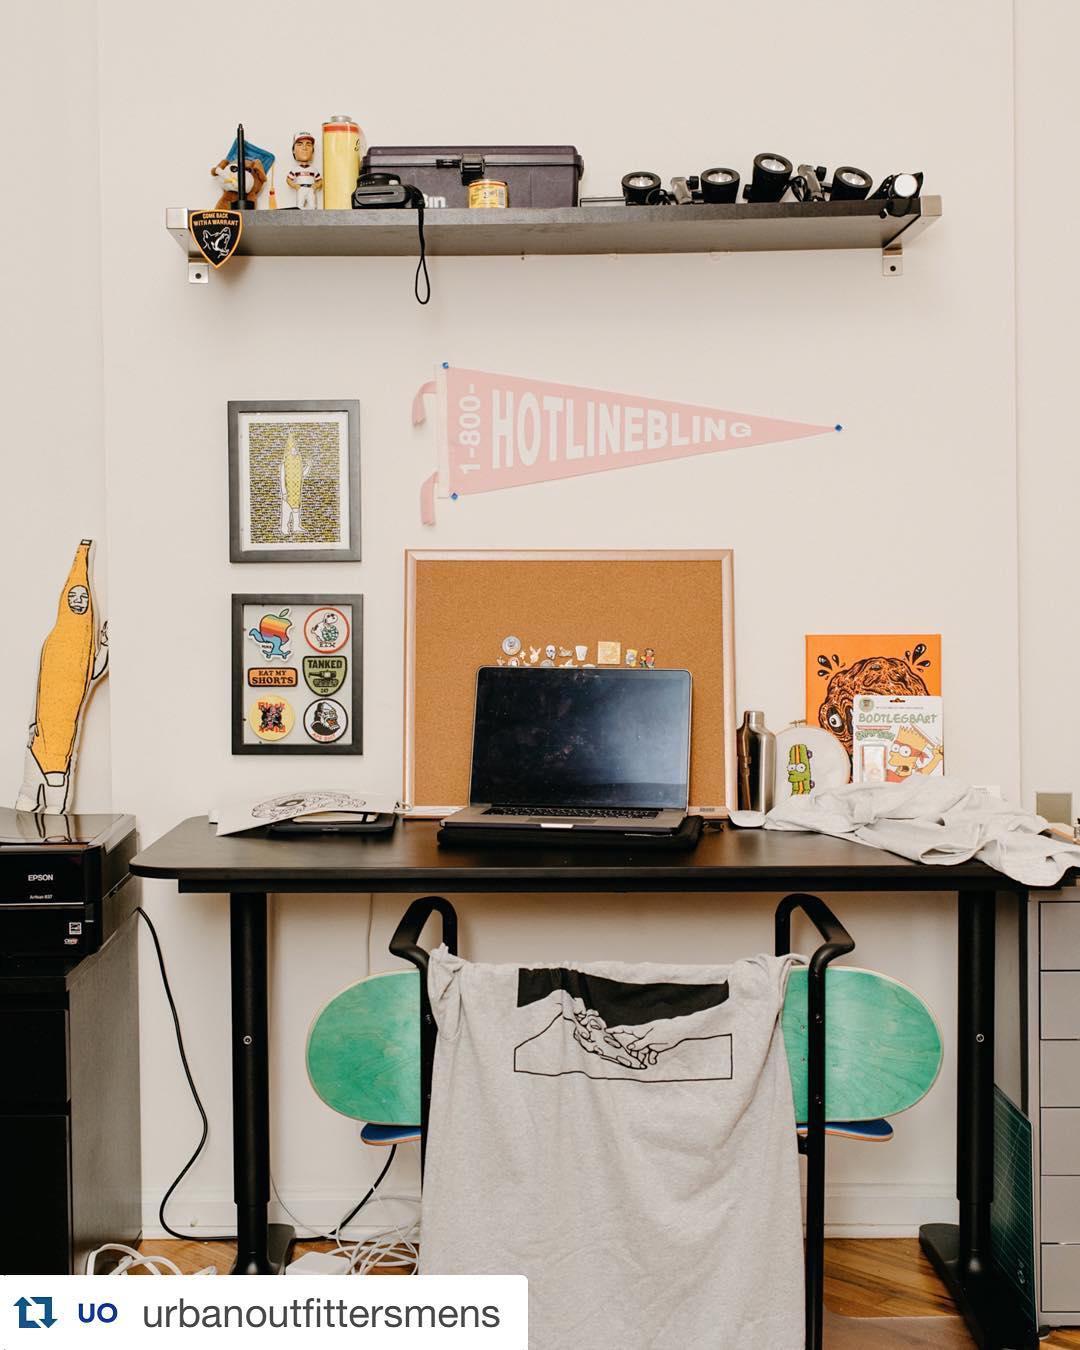 Desk of joeflomontana